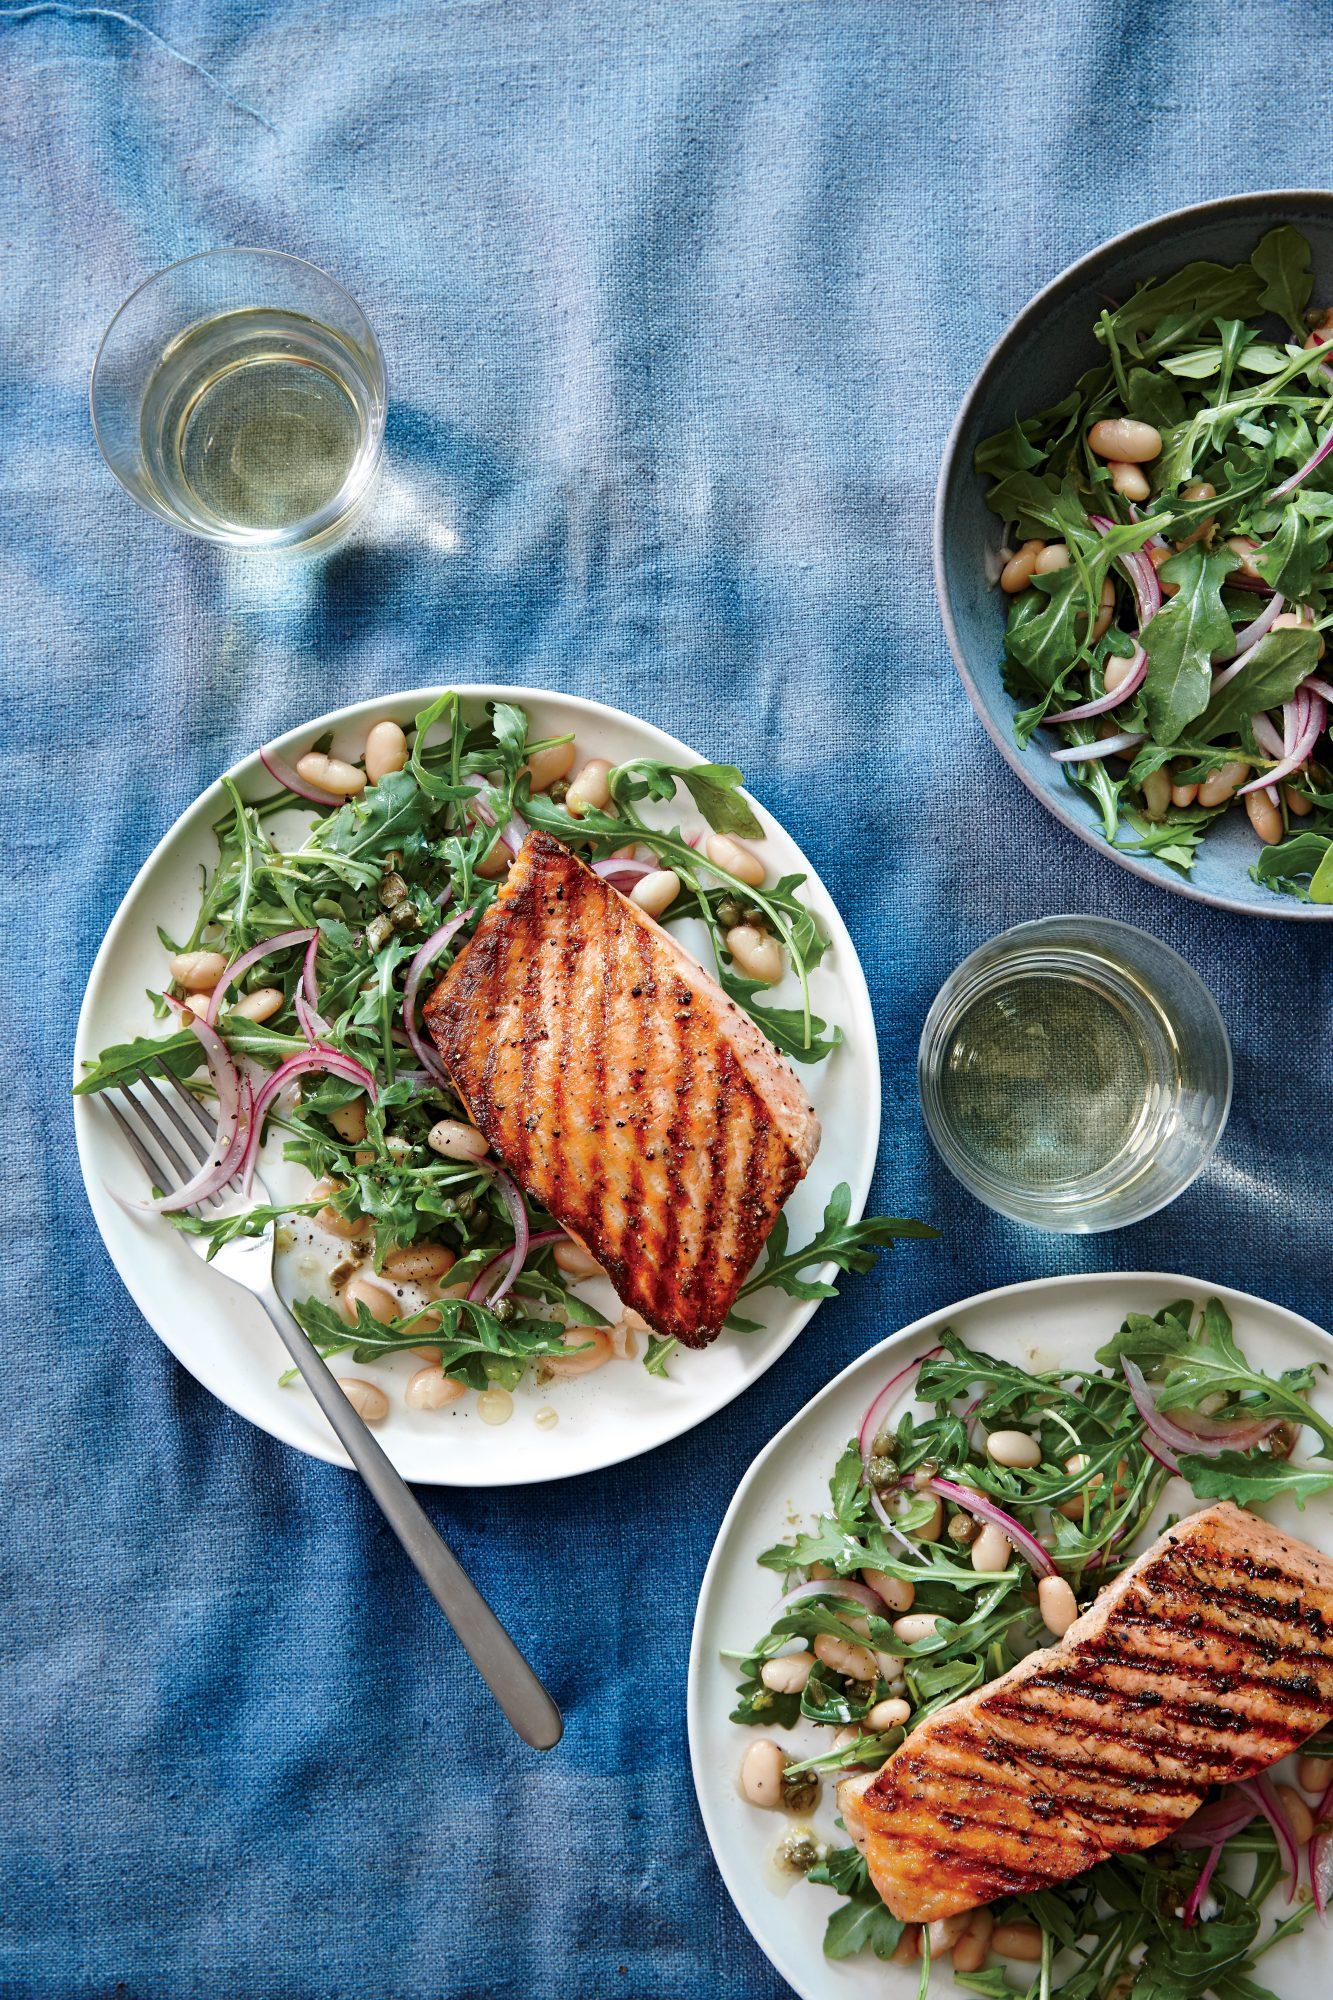 Salmon, Meet Grill